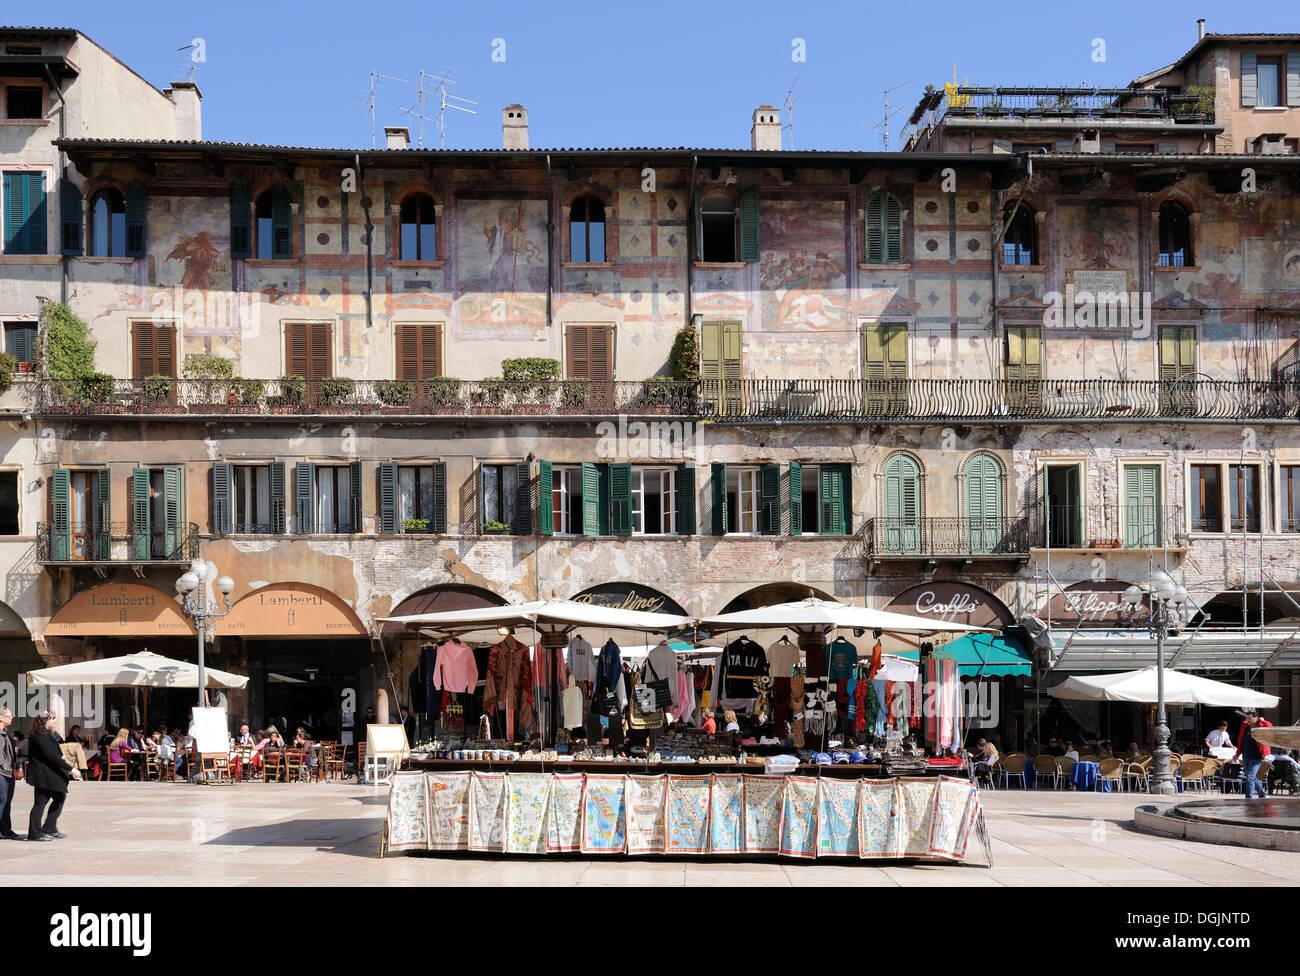 Piazza Delle Erbe Platz, Verona, Italien, Europa Stockbild